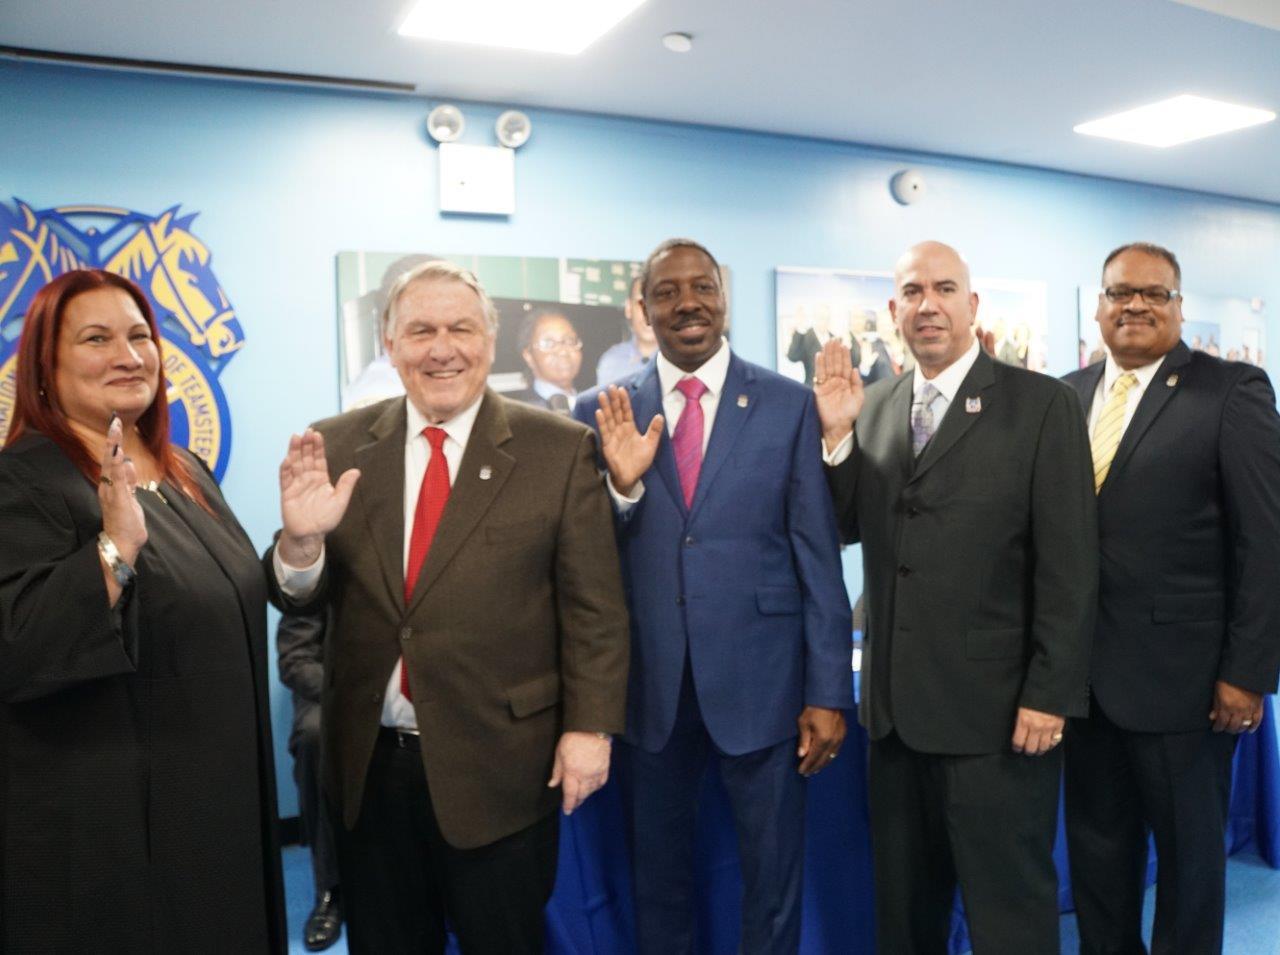 Teamsters Local 237 Executive Board Sworn In